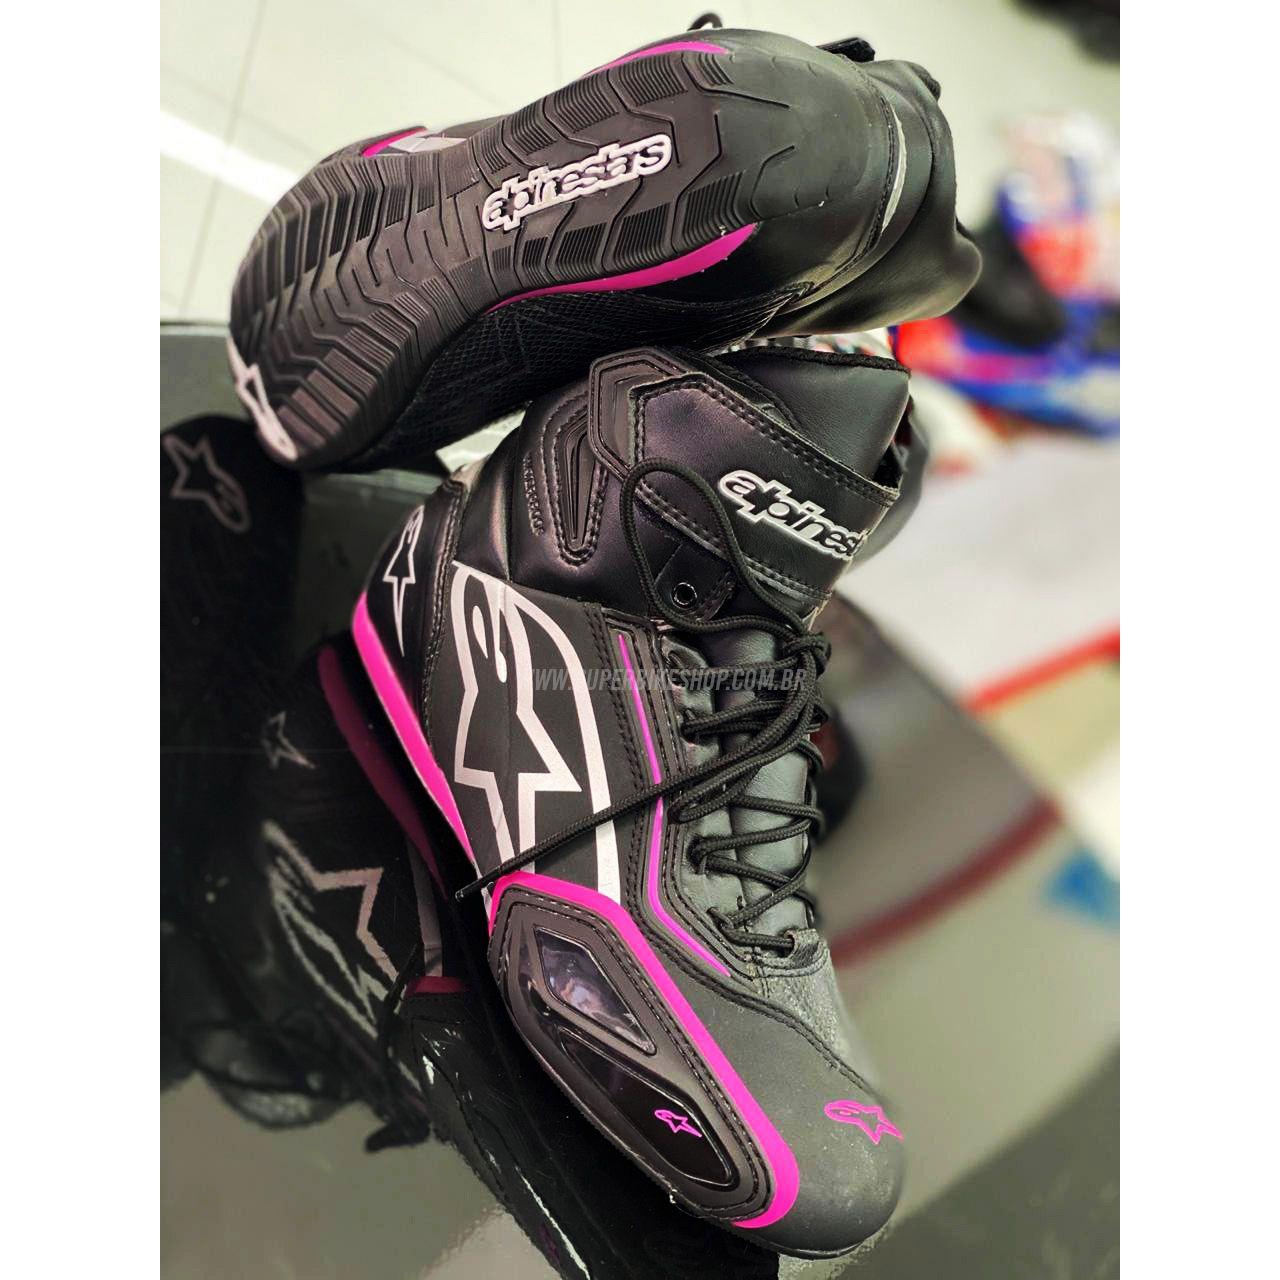 Tênis Alpinestars Stella Faster 2 WP (Feminina) Preto/Rosa - 100% Impermeável  - Super Bike - Loja Oficial Alpinestars